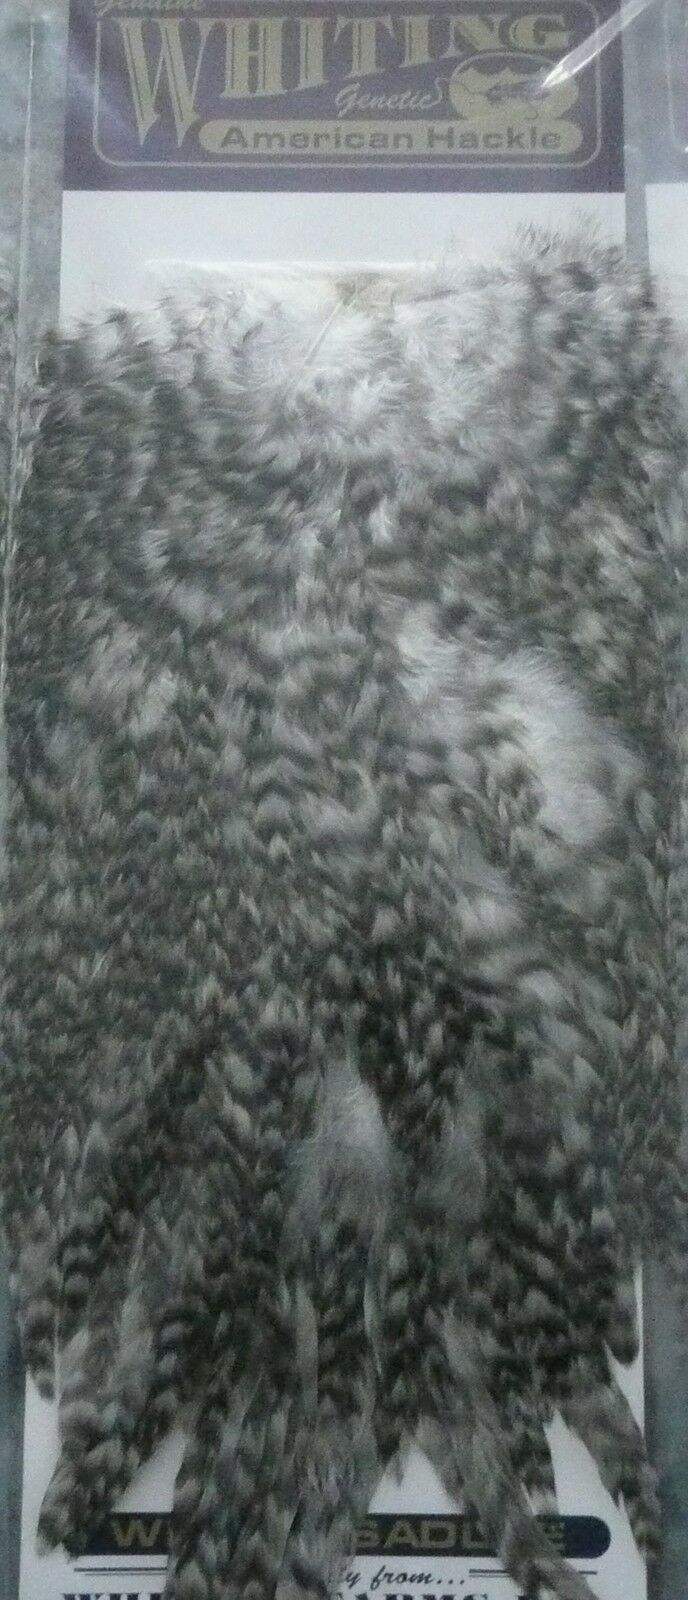 SELLE SADDLE COQ WHITING FARMS GRIZZLY sèche noyée streamer mosca flies